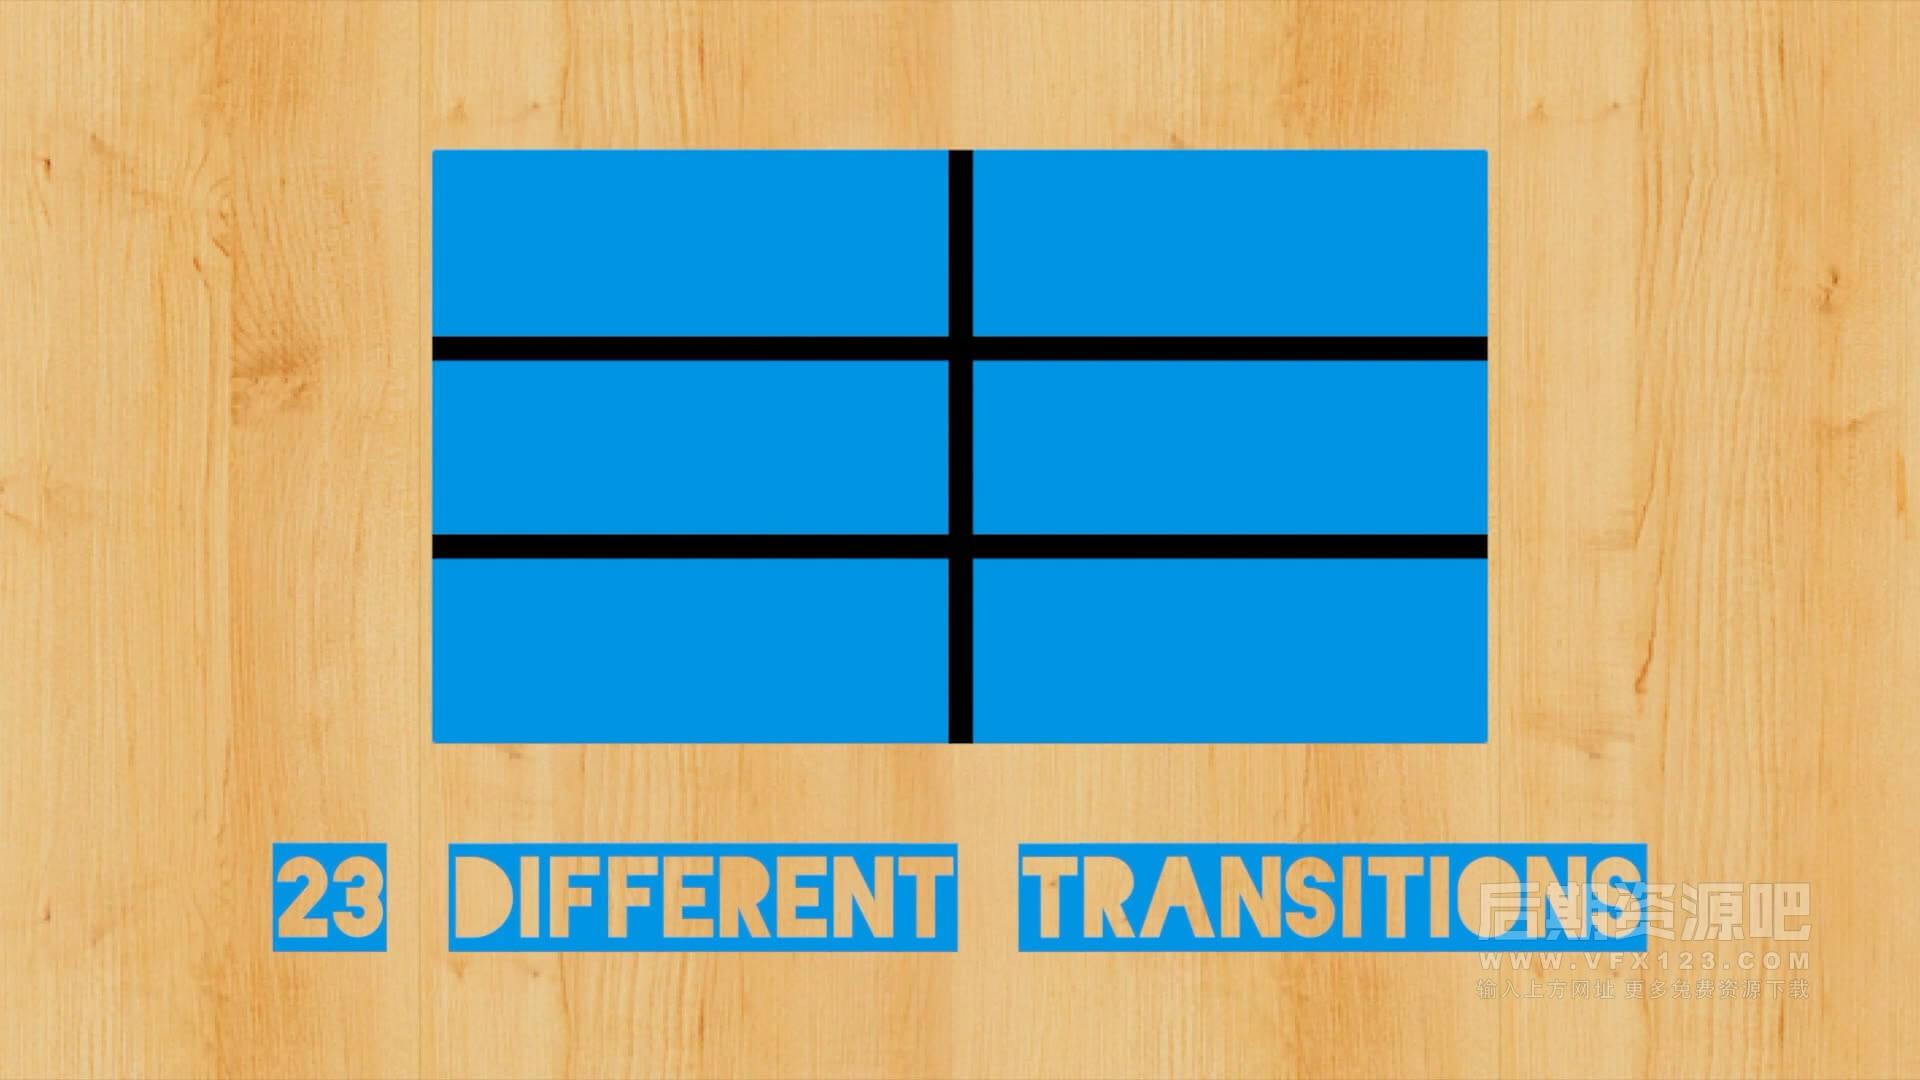 fcpx插件 23种多屏分割样式745个过渡动画转场预设 支持M1 Block Pop